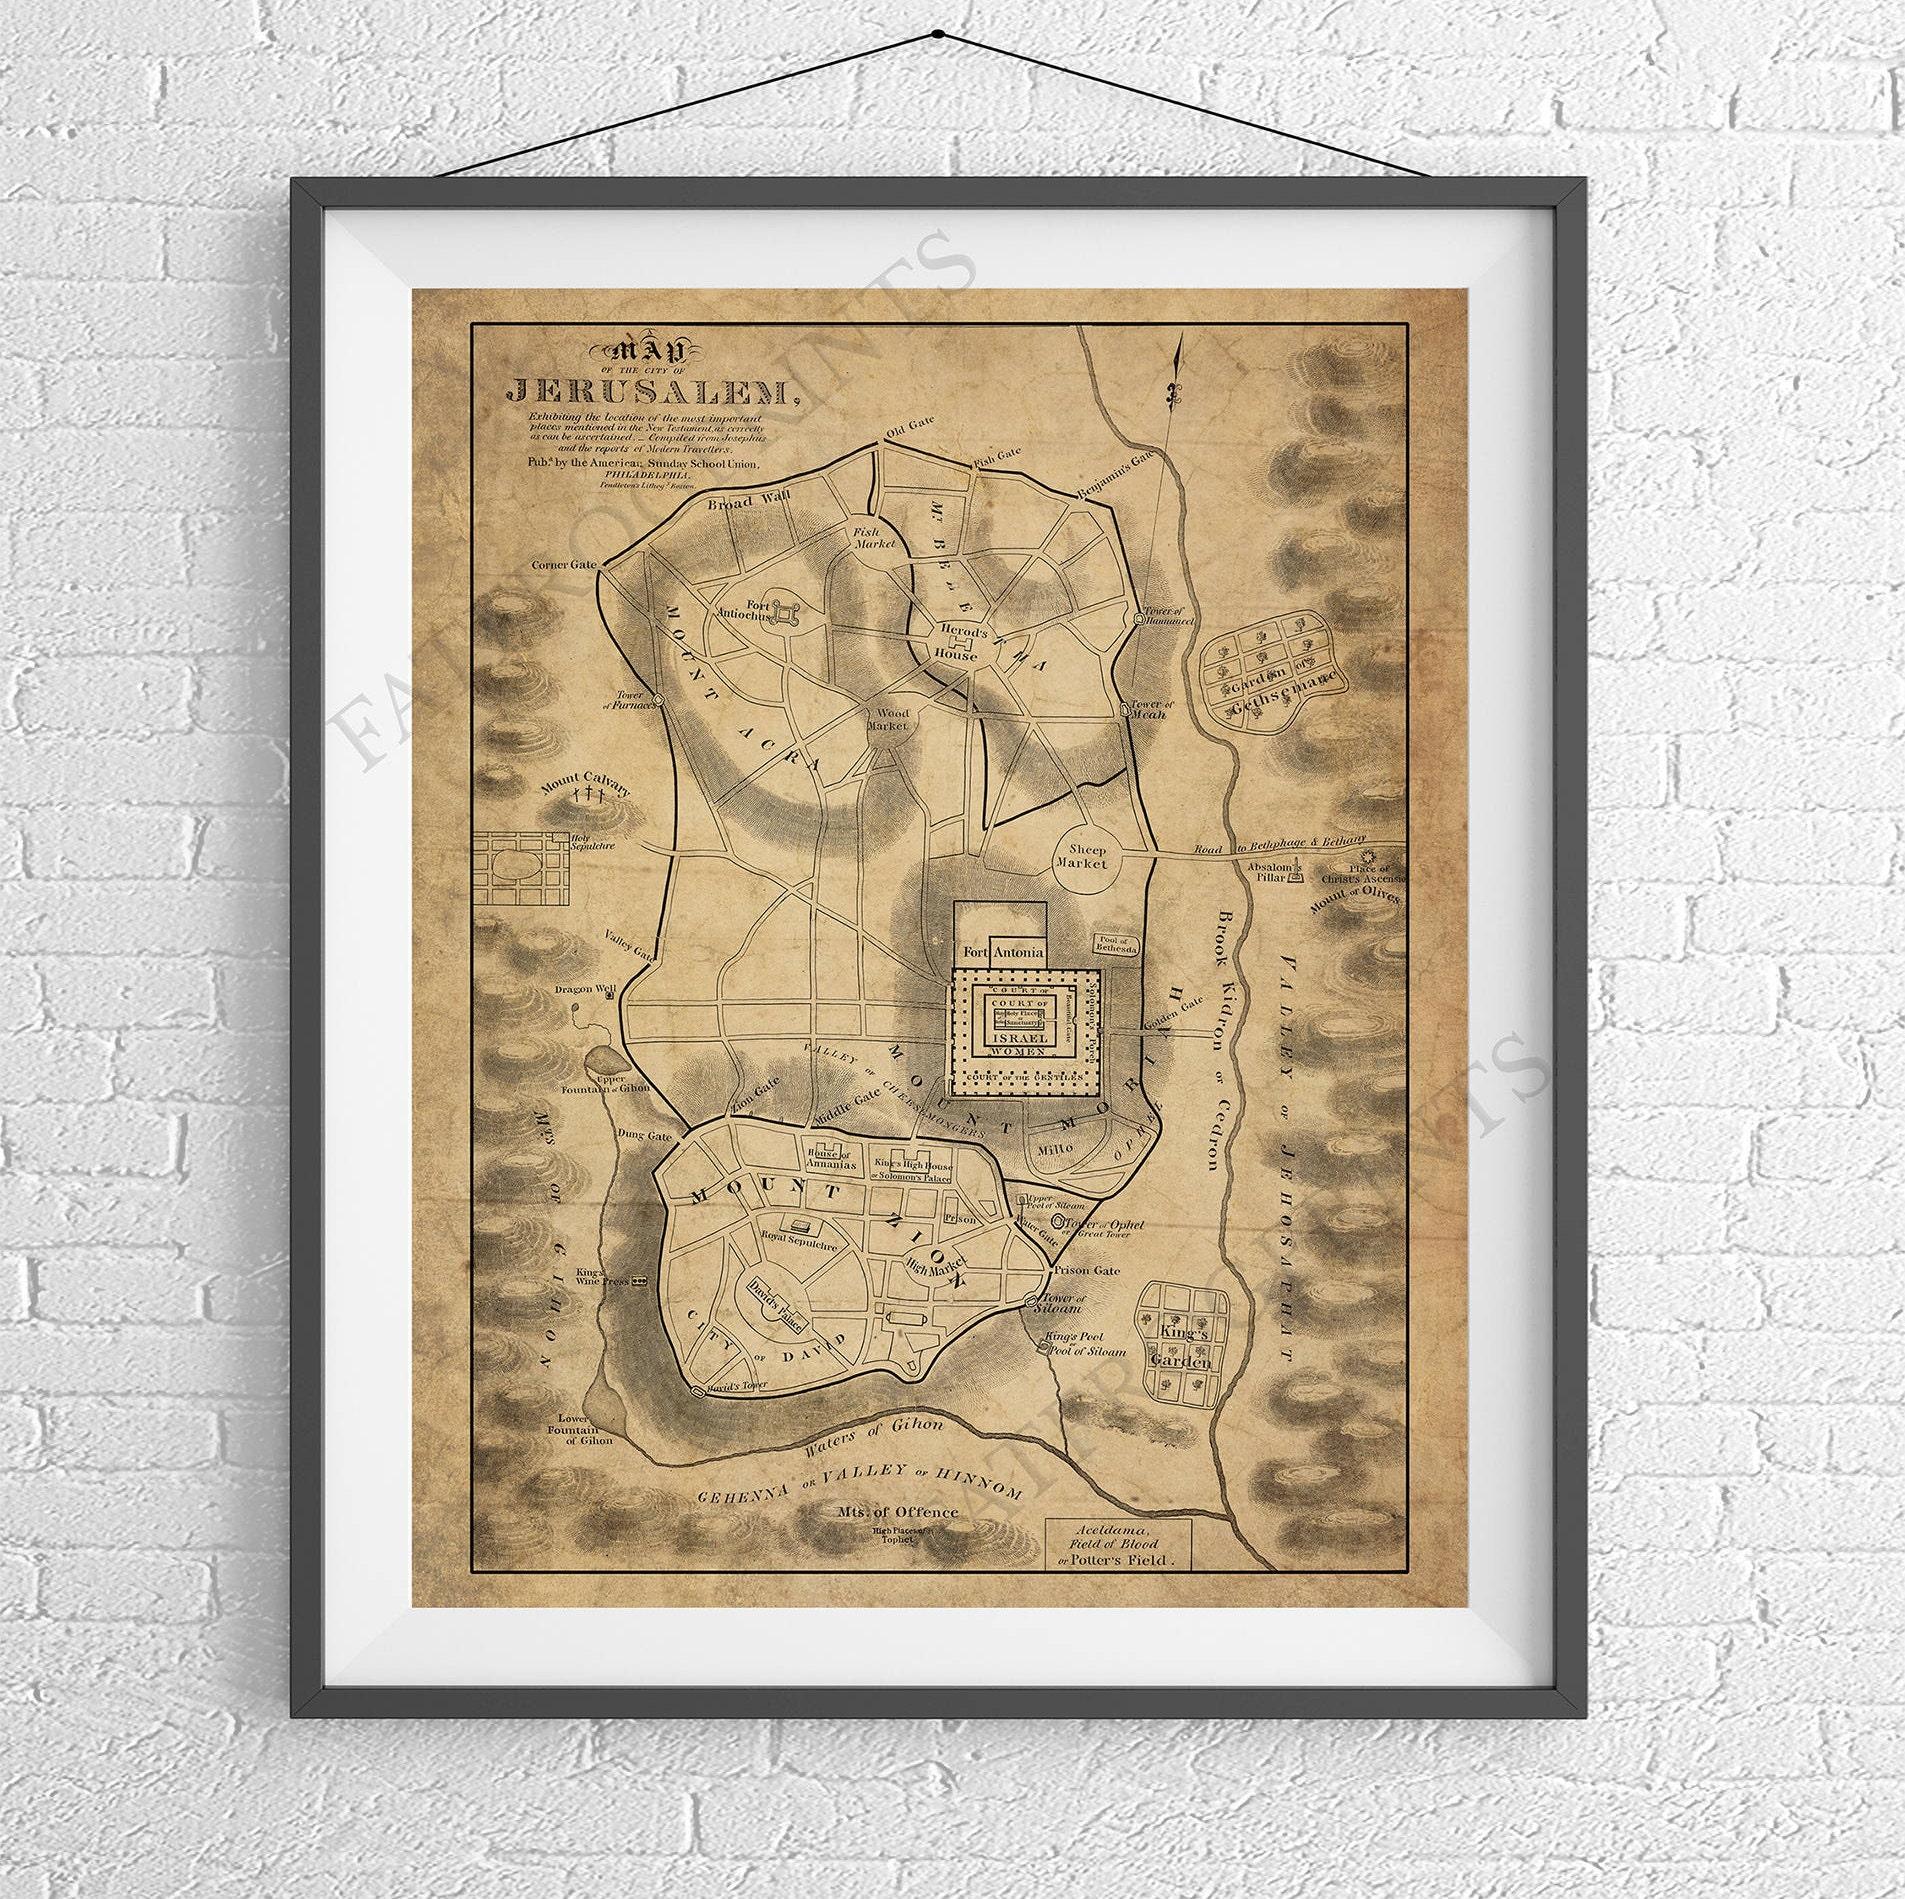 Jerusalem Map Print, Bible New Testament Map, Biblical Map ...